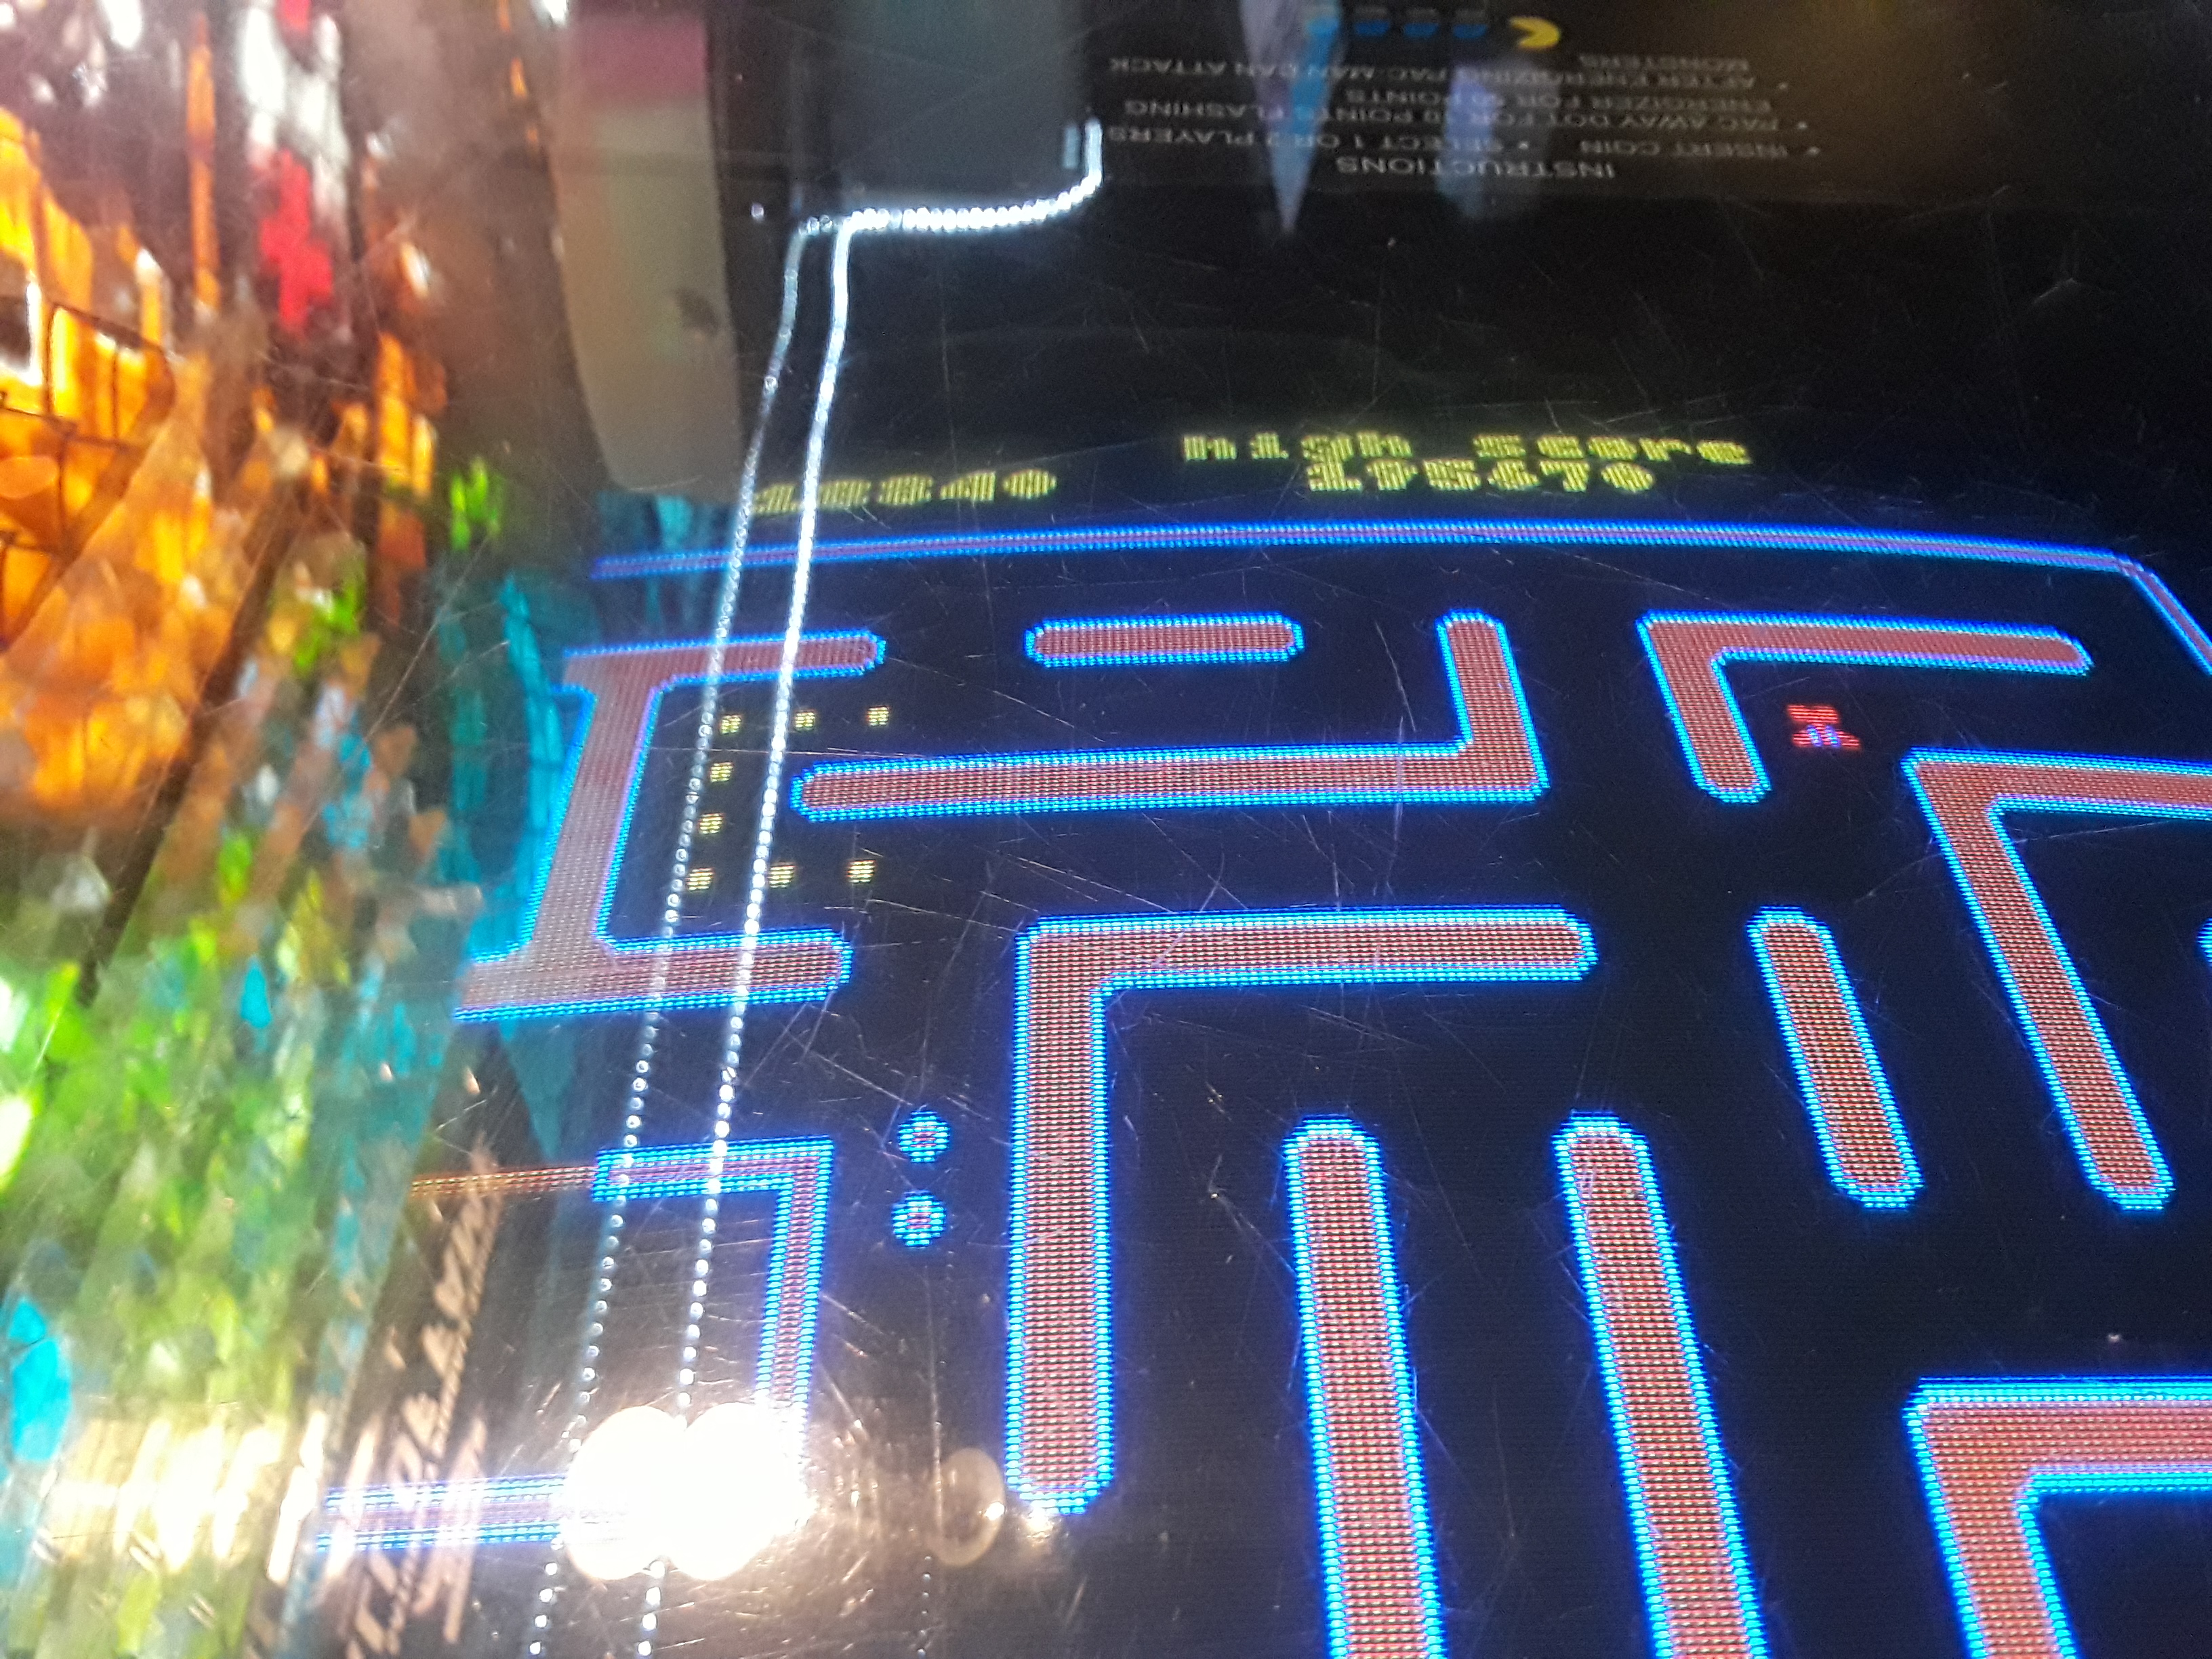 JML101582: Jr. Pac-Man (Arcade) 18,840 points on 2018-08-18 19:00:58